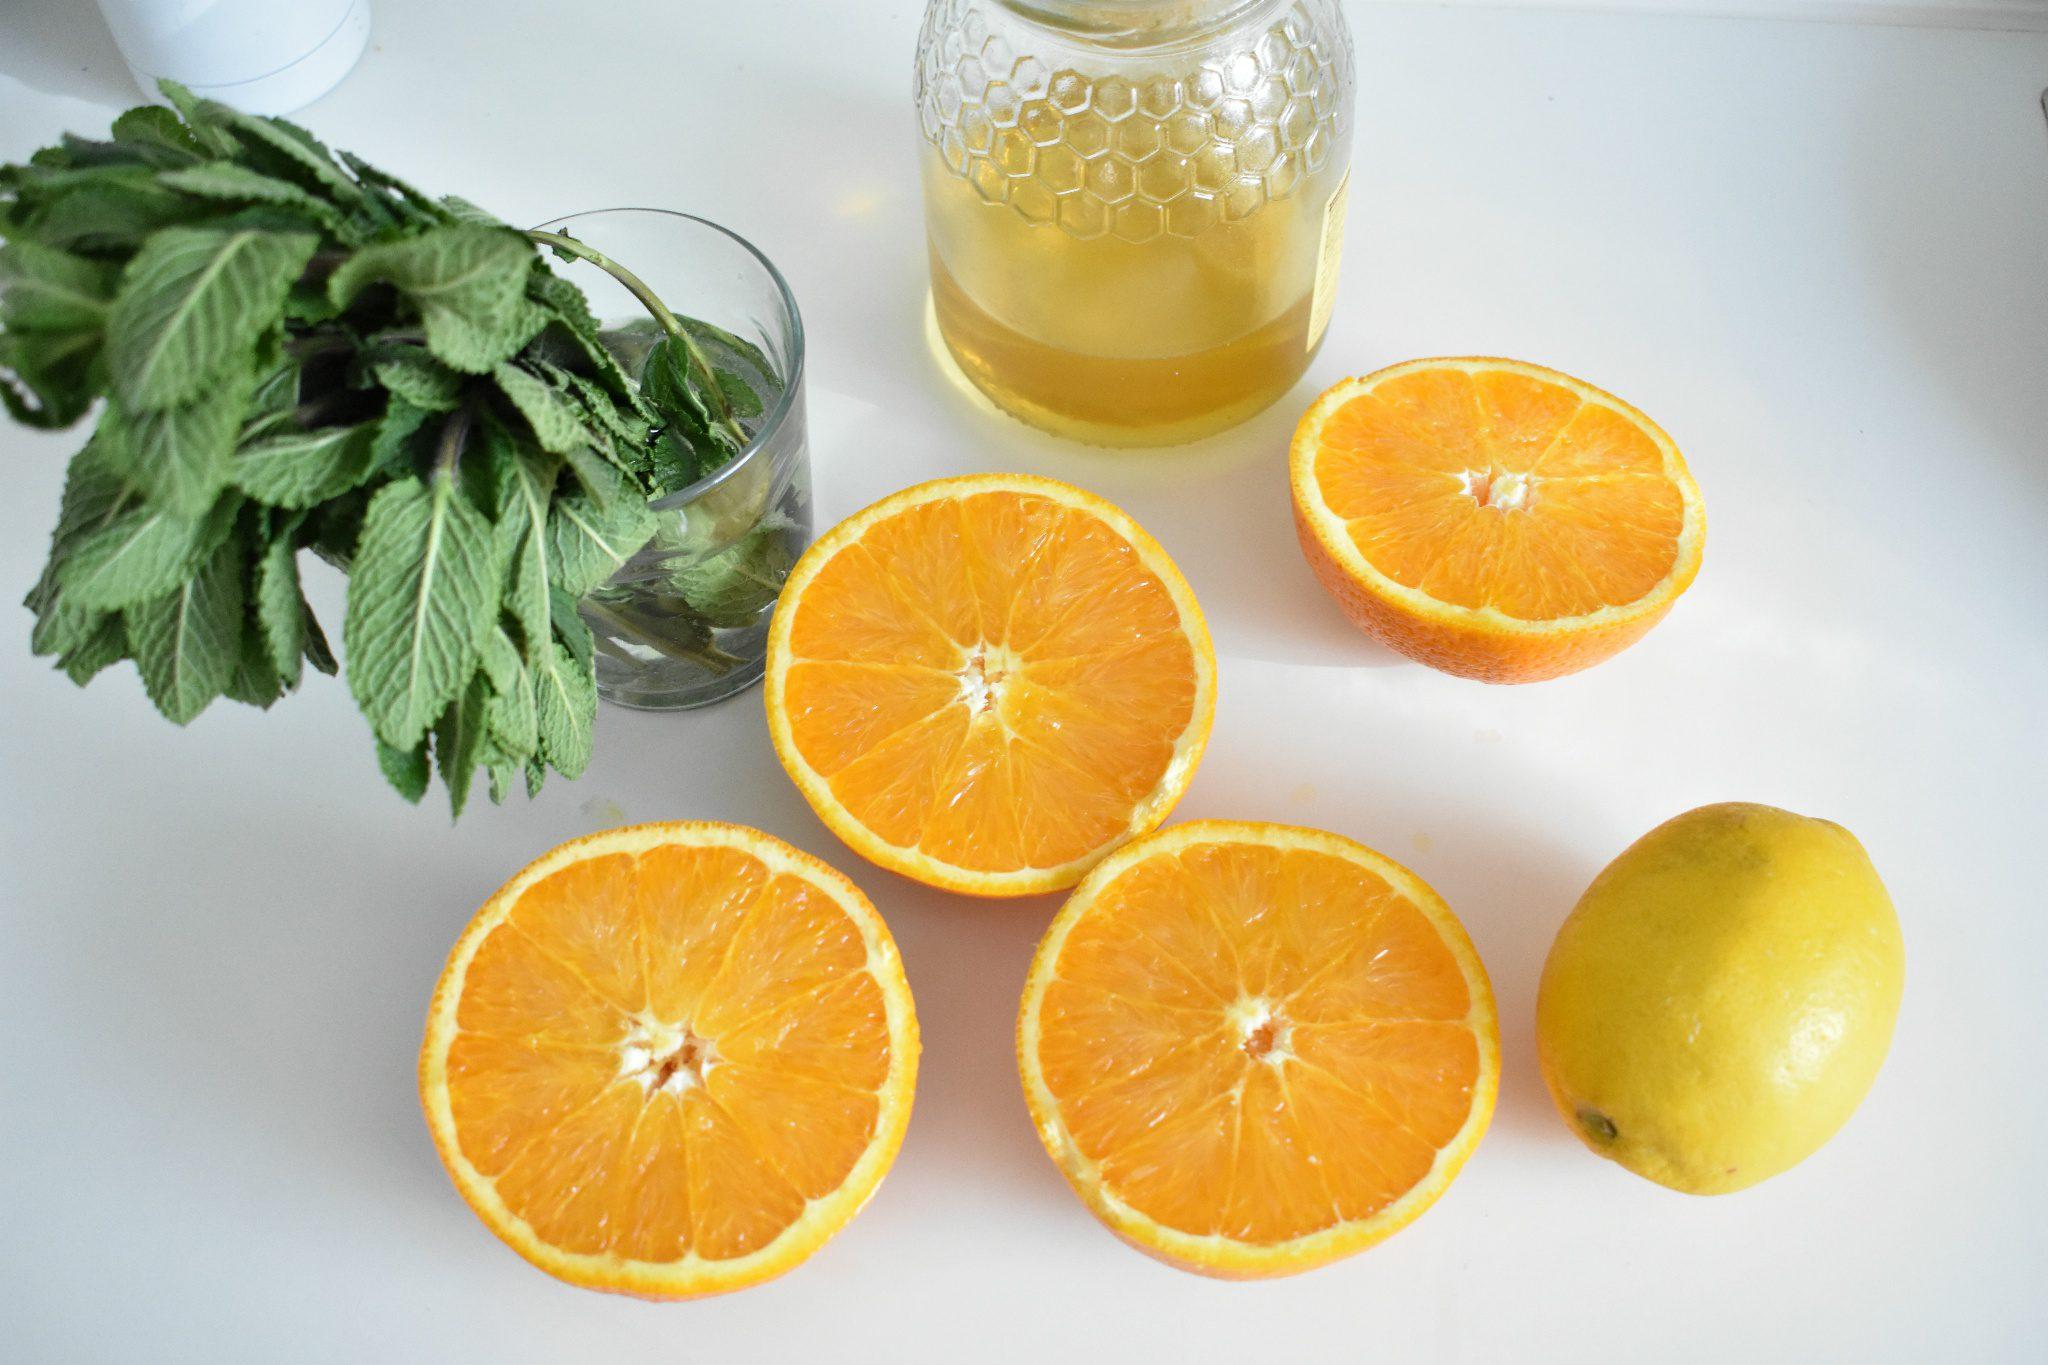 Lemonade-orange-process-SunCakeMom